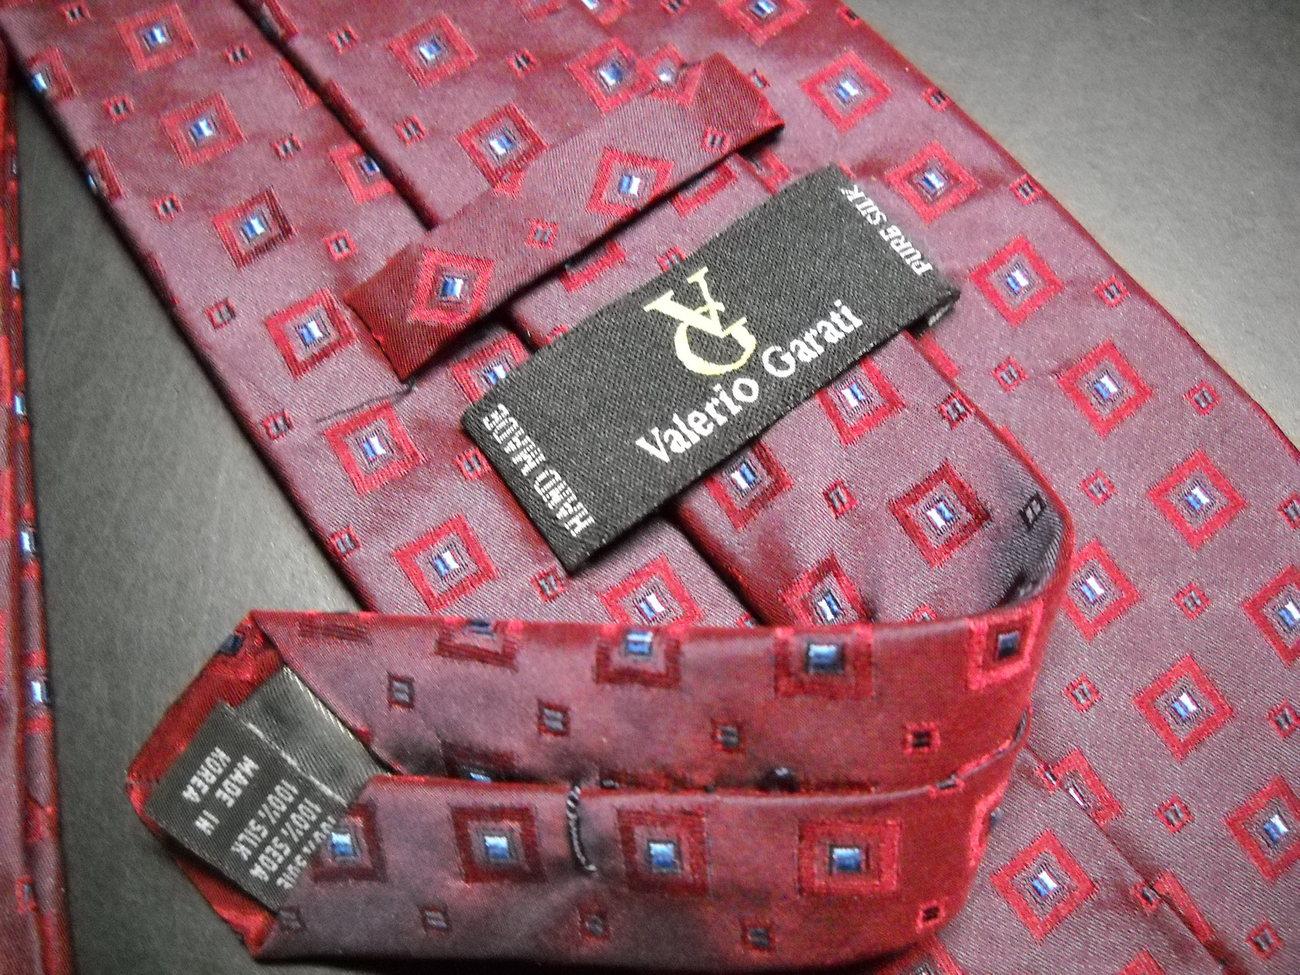 Valerio Garati Neck Tie Silk Hand Made Bright Reds Maroons and Blues image 6